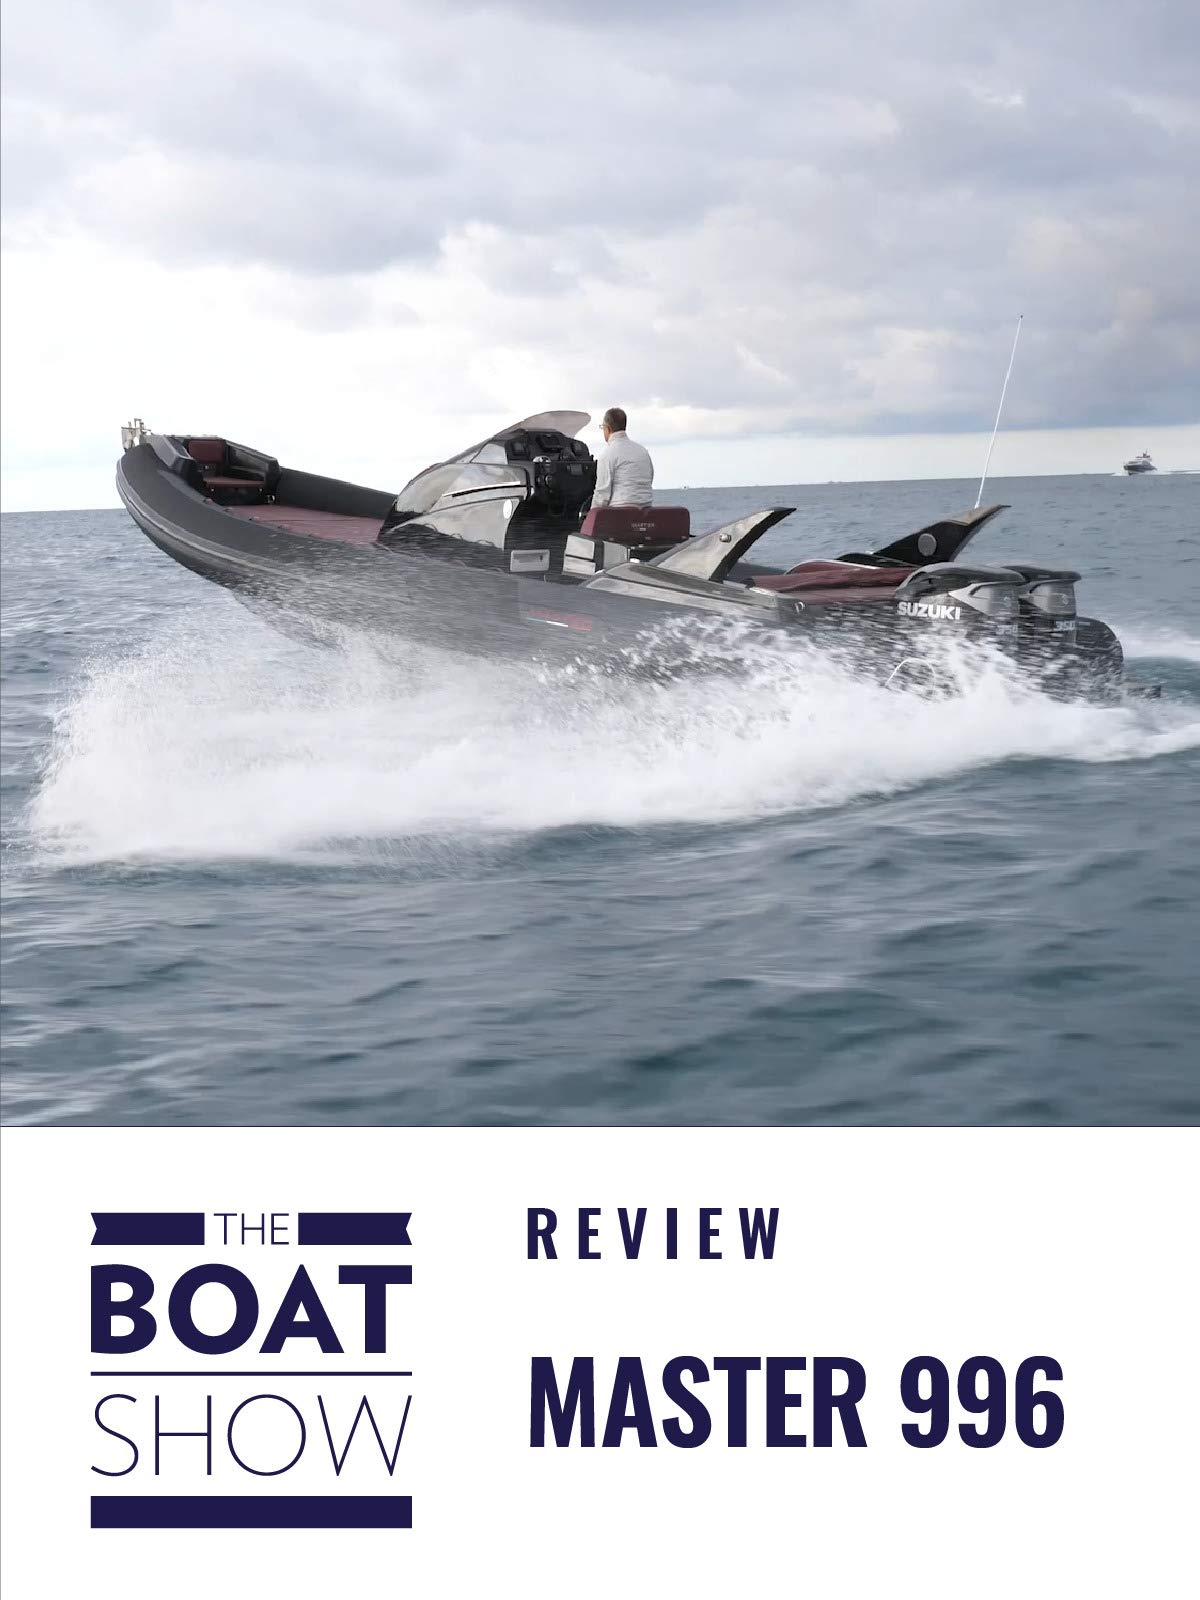 Clip: Master 996 - The Boat Show